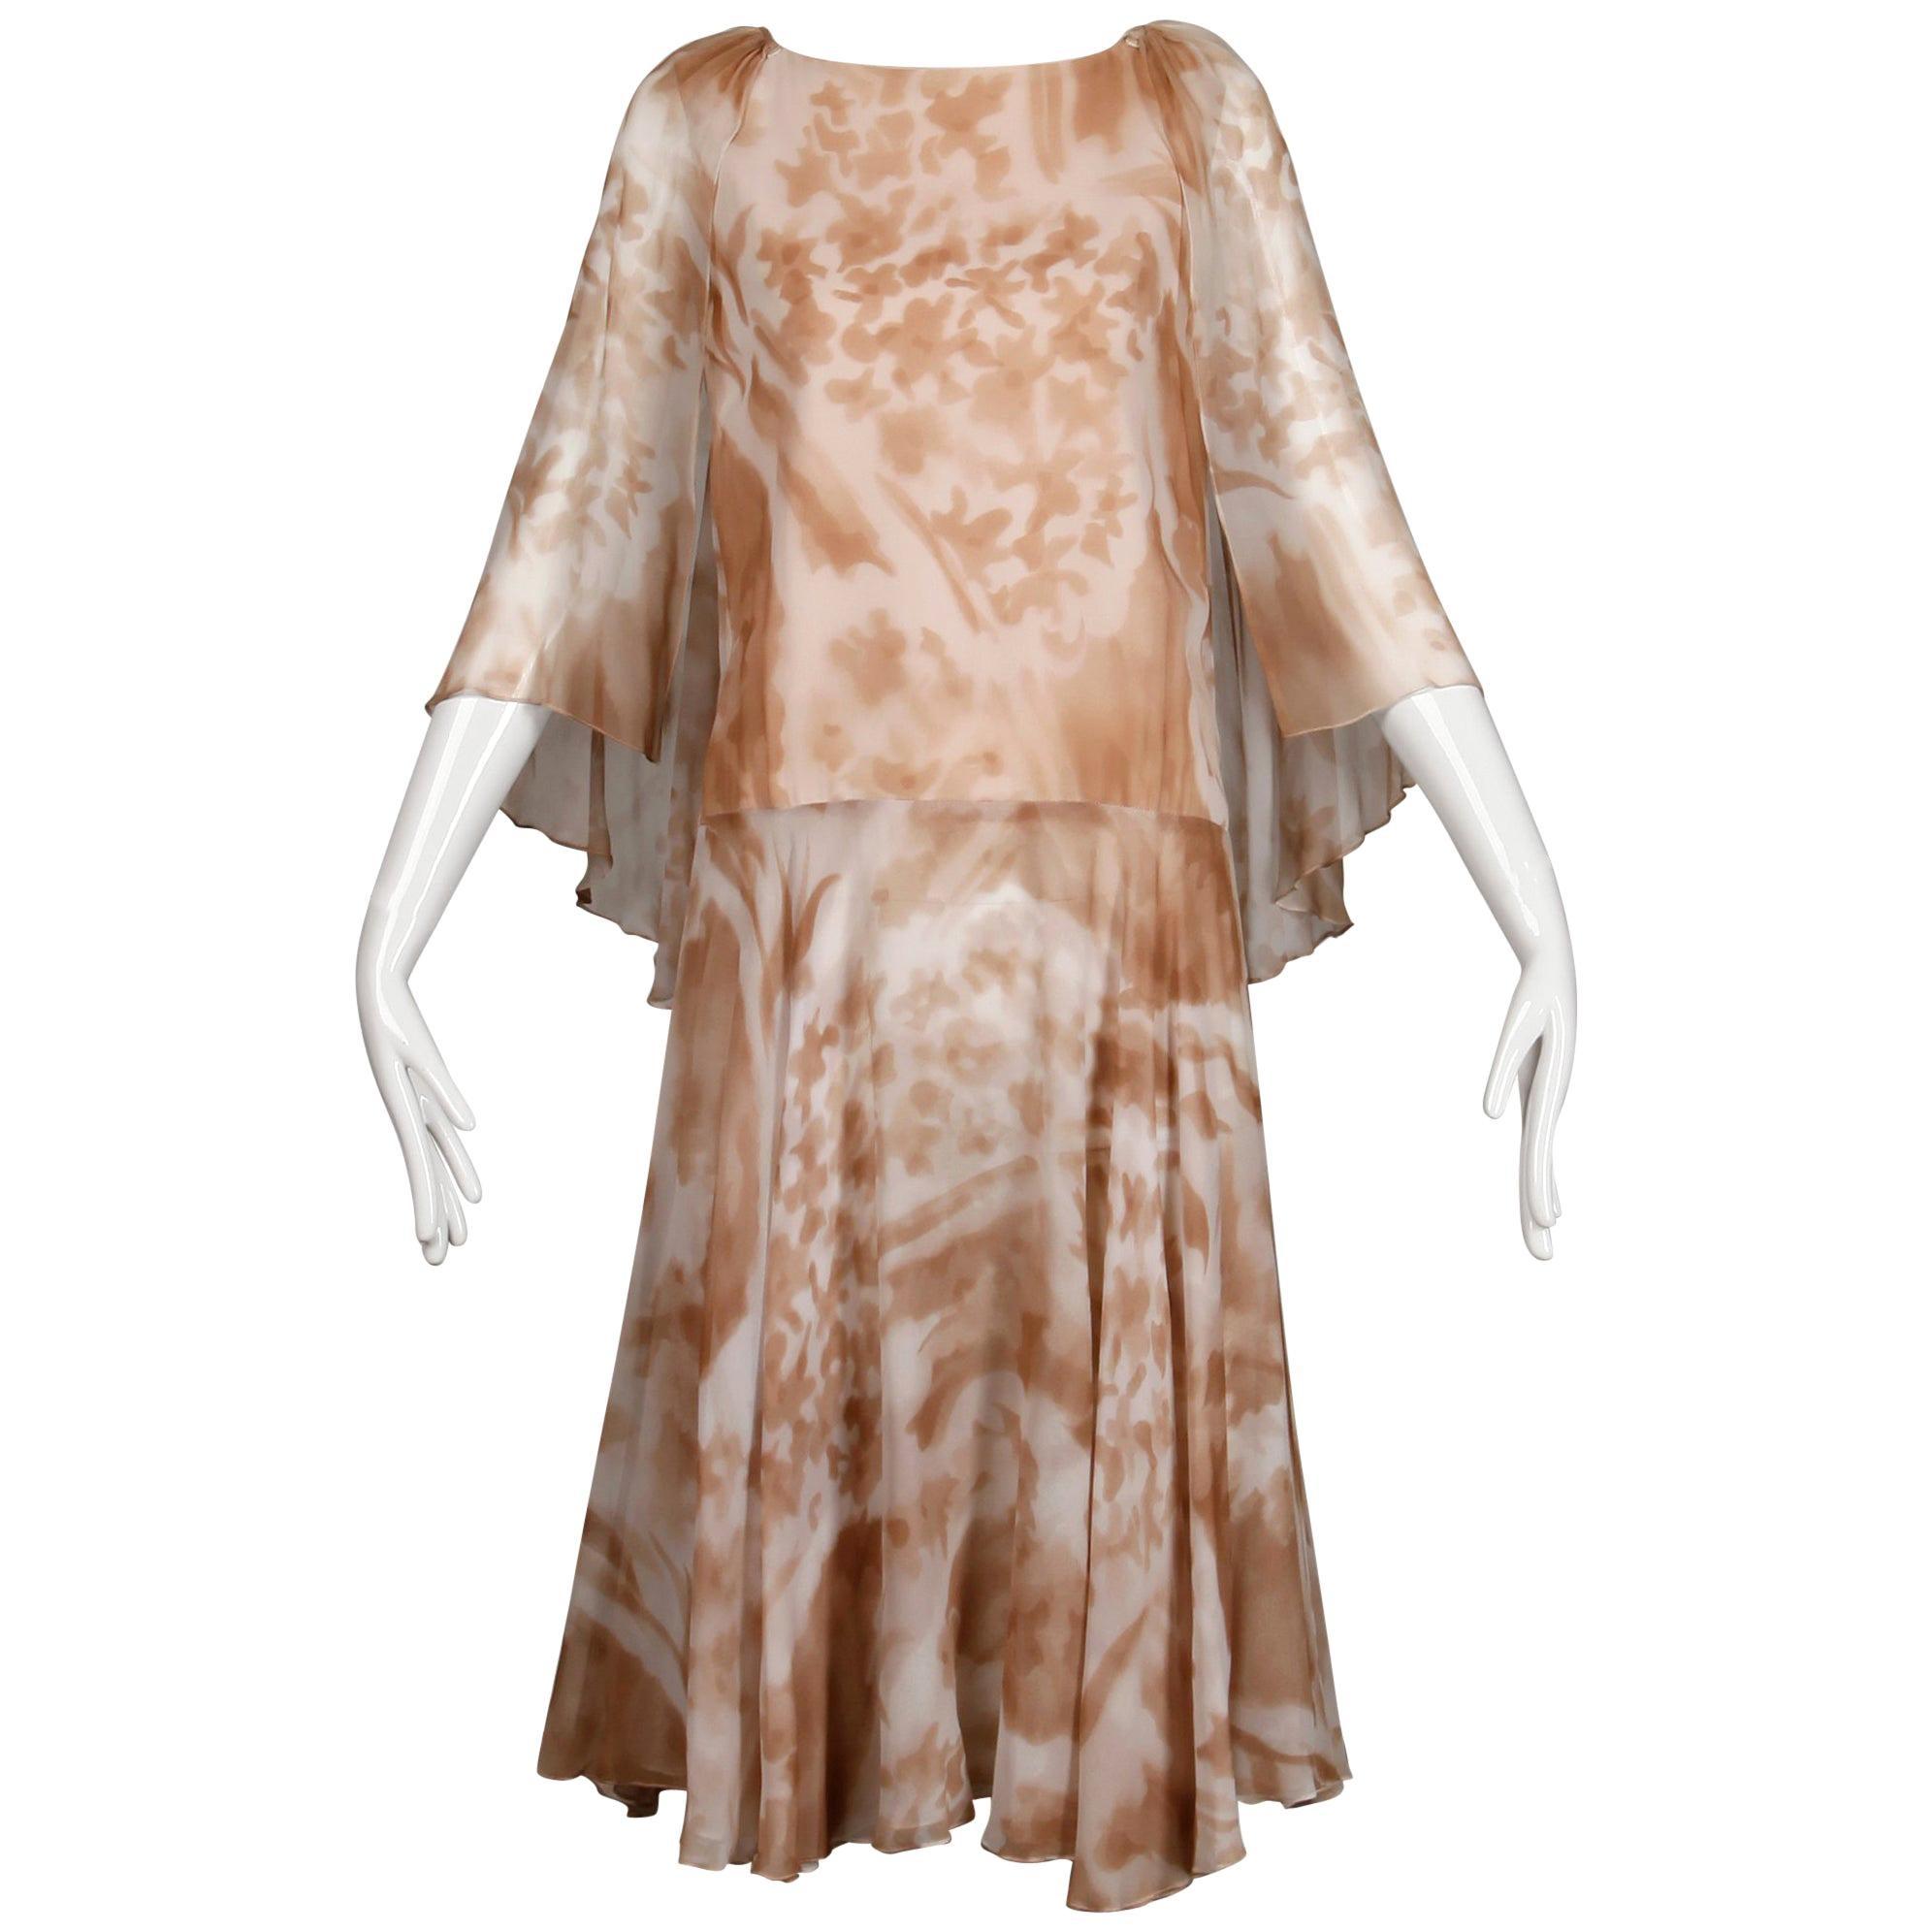 1970s Mr. Blackwell Vintage Sheer Silk Chiffon Print Dress with Detachable Cape